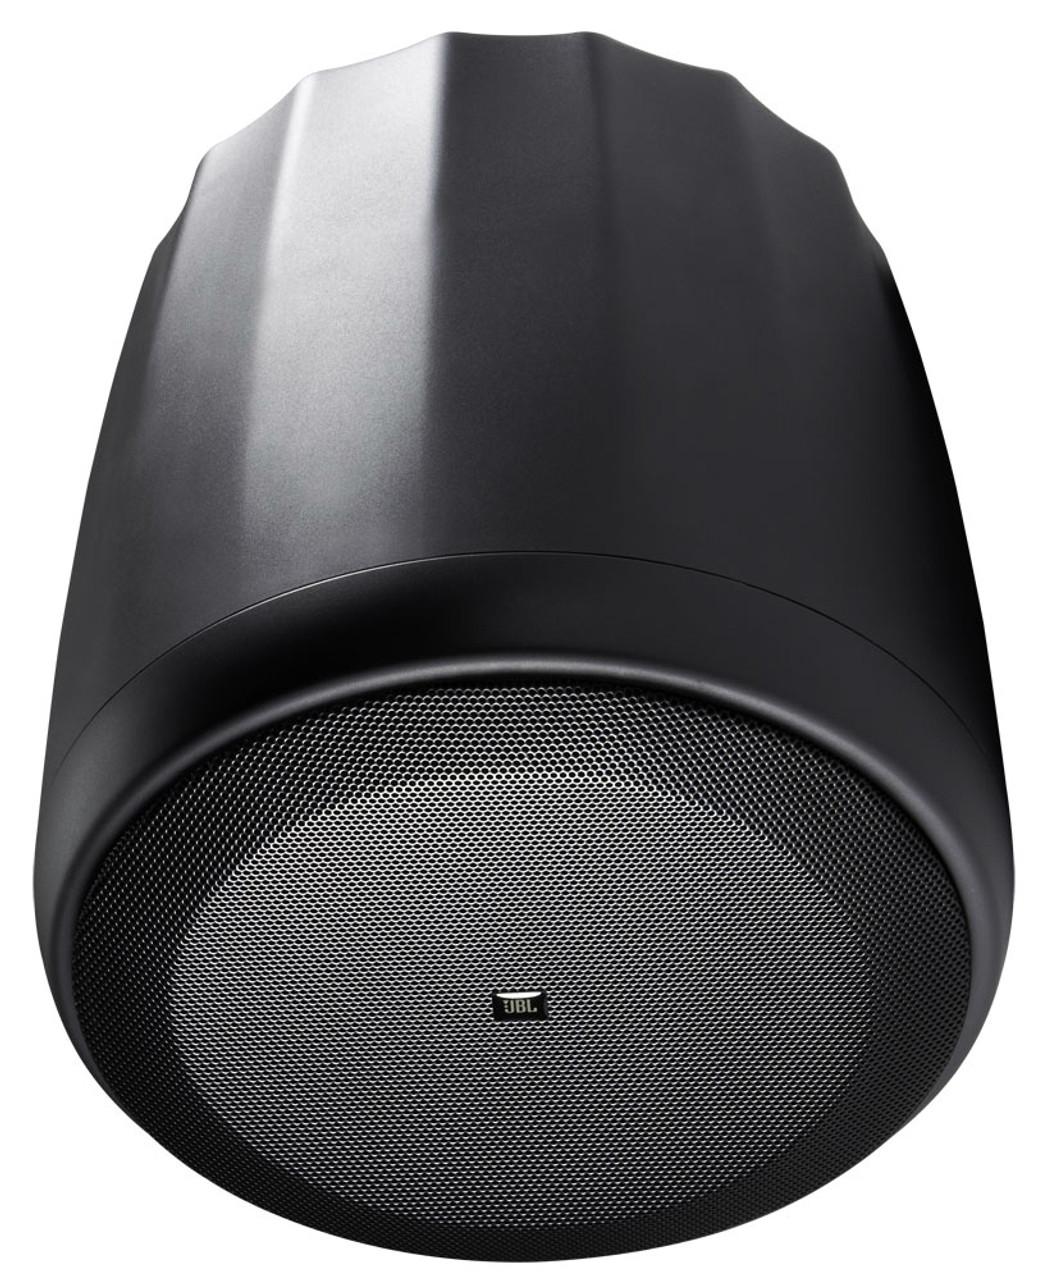 Jbl compact full range pendant speakers c65pt mozeypictures Gallery